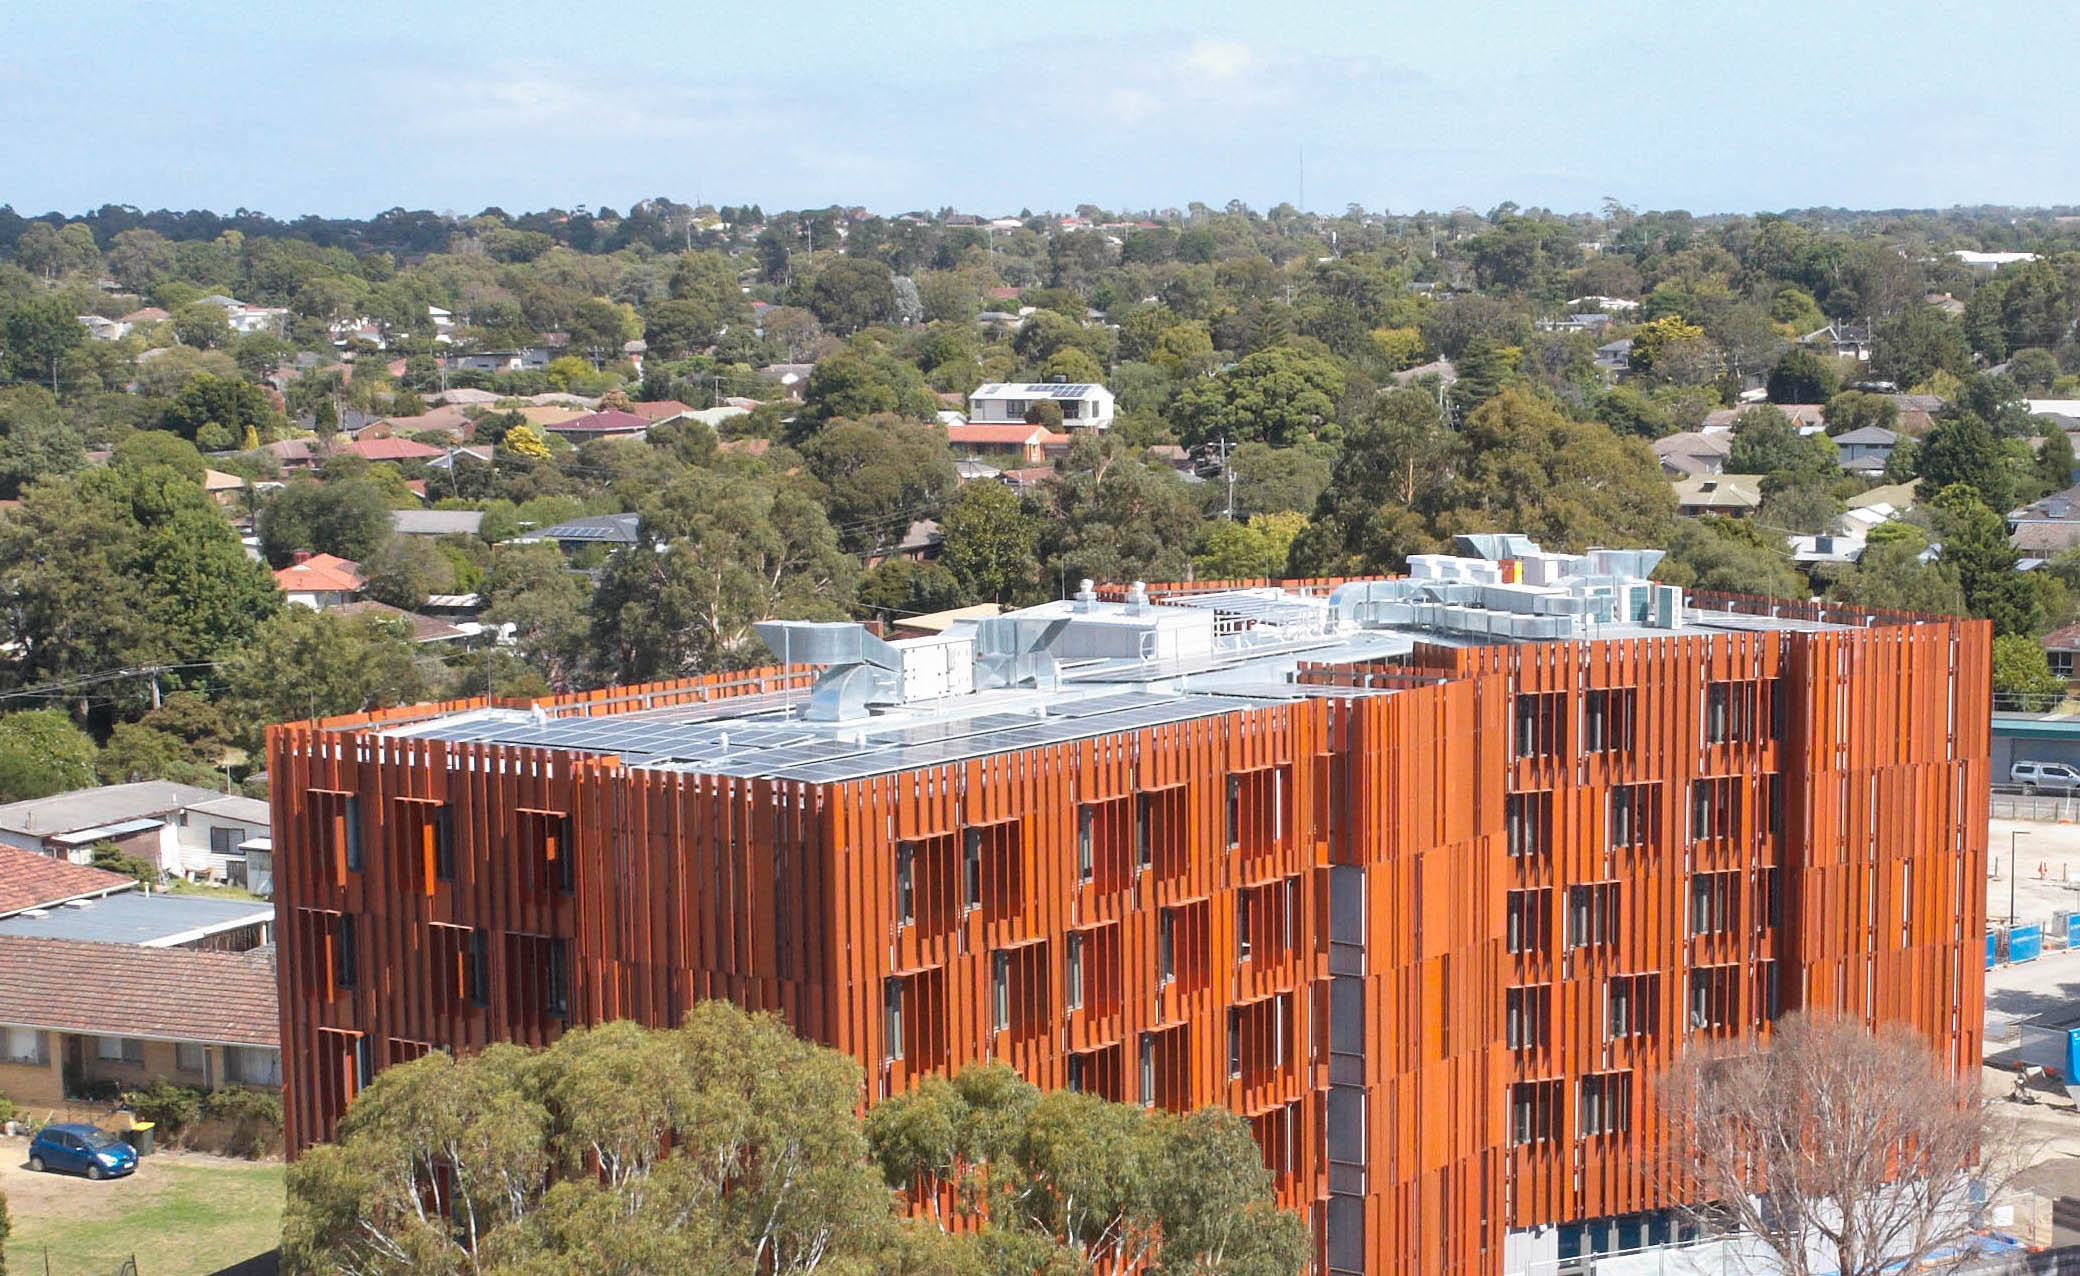 Monash University student accommodation